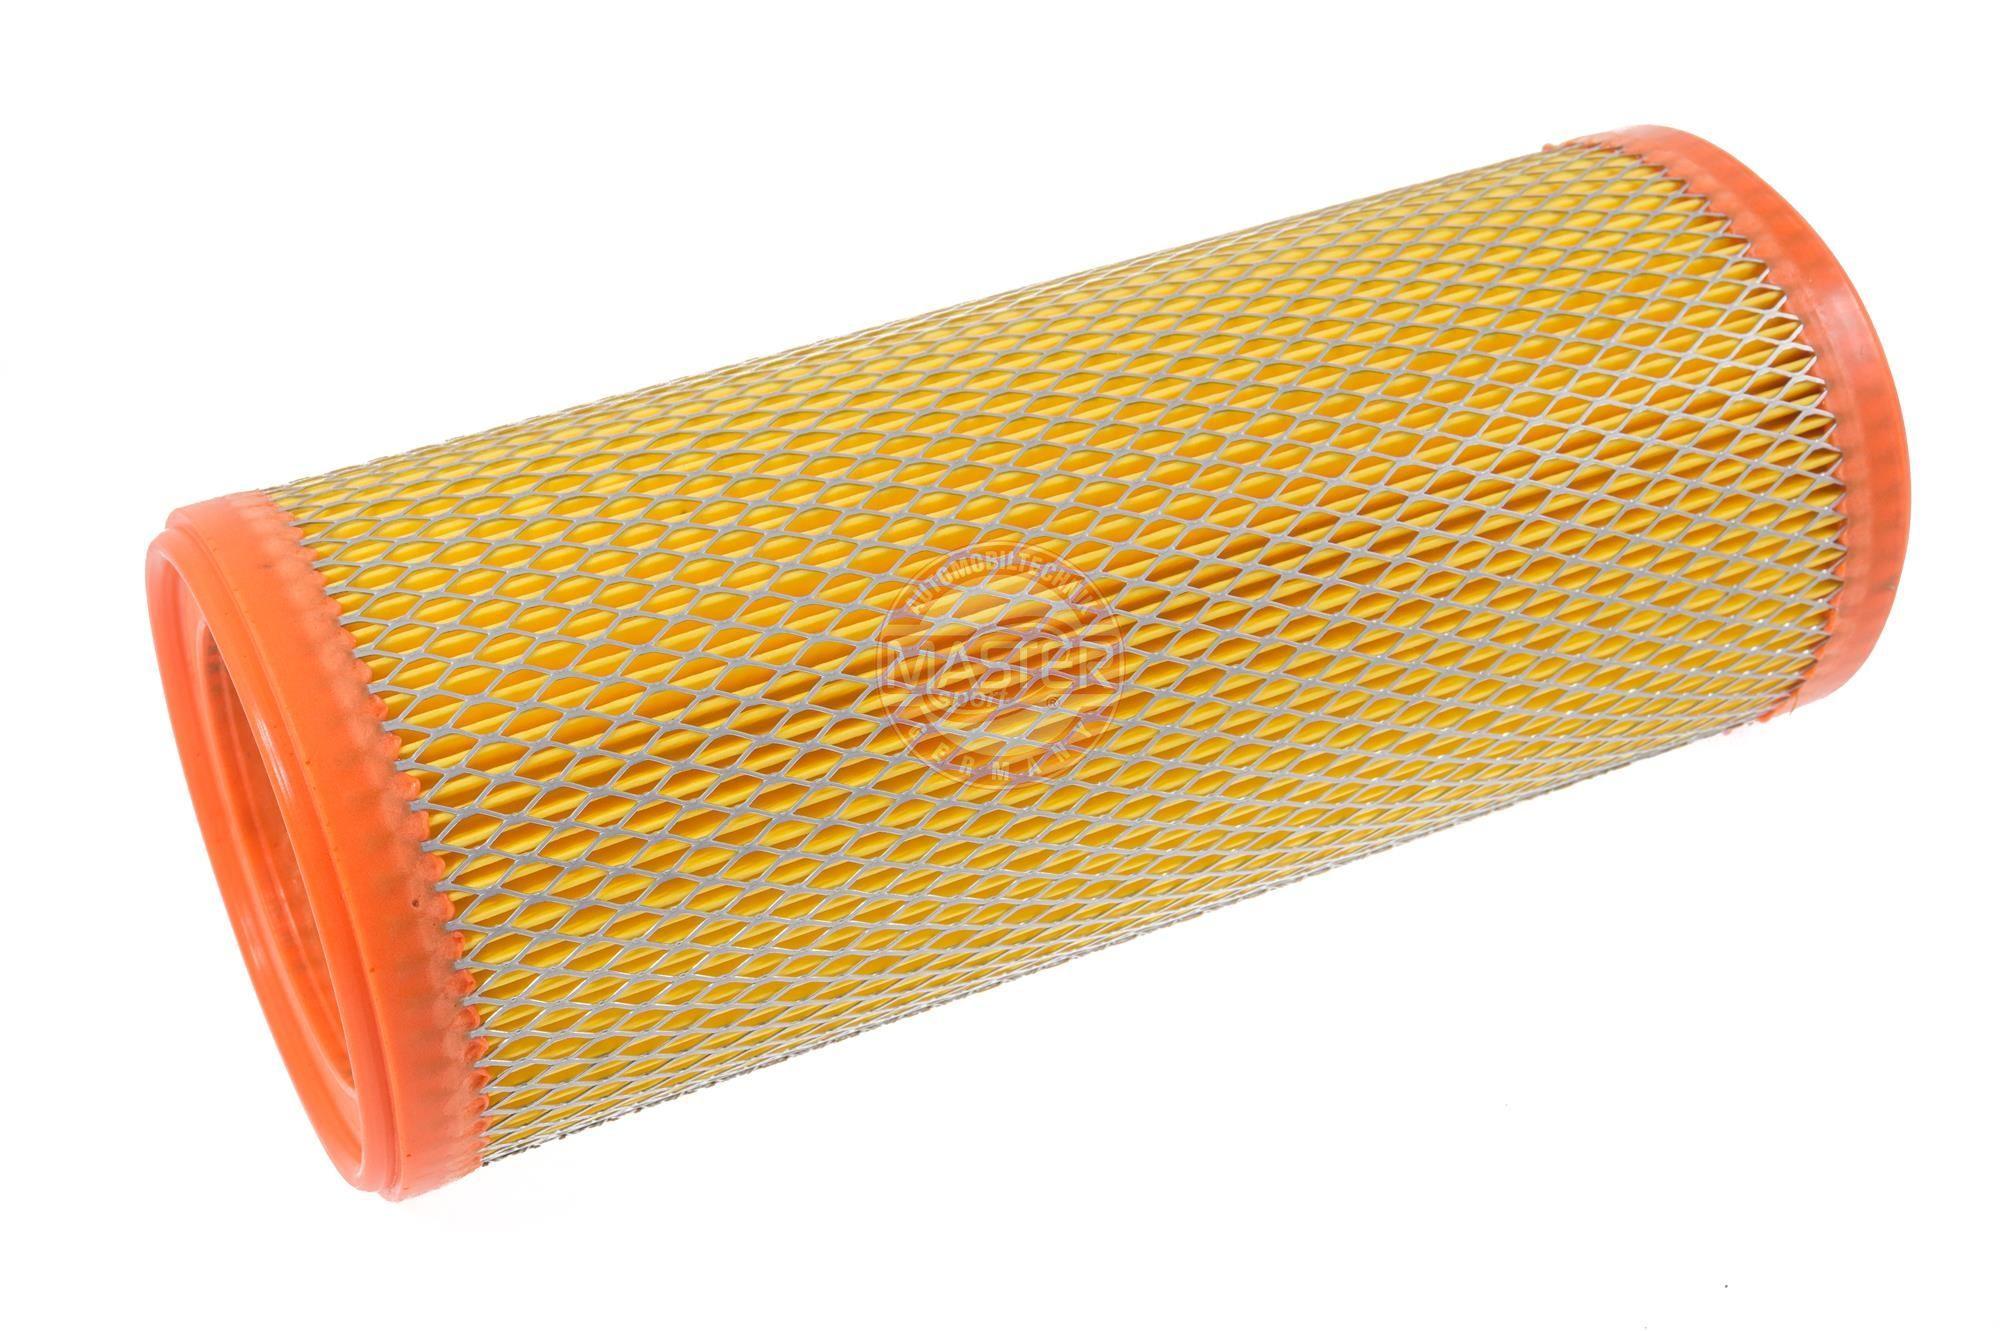 Buy original Air filter MASTER-SPORT 13109-LF-PCS-MS